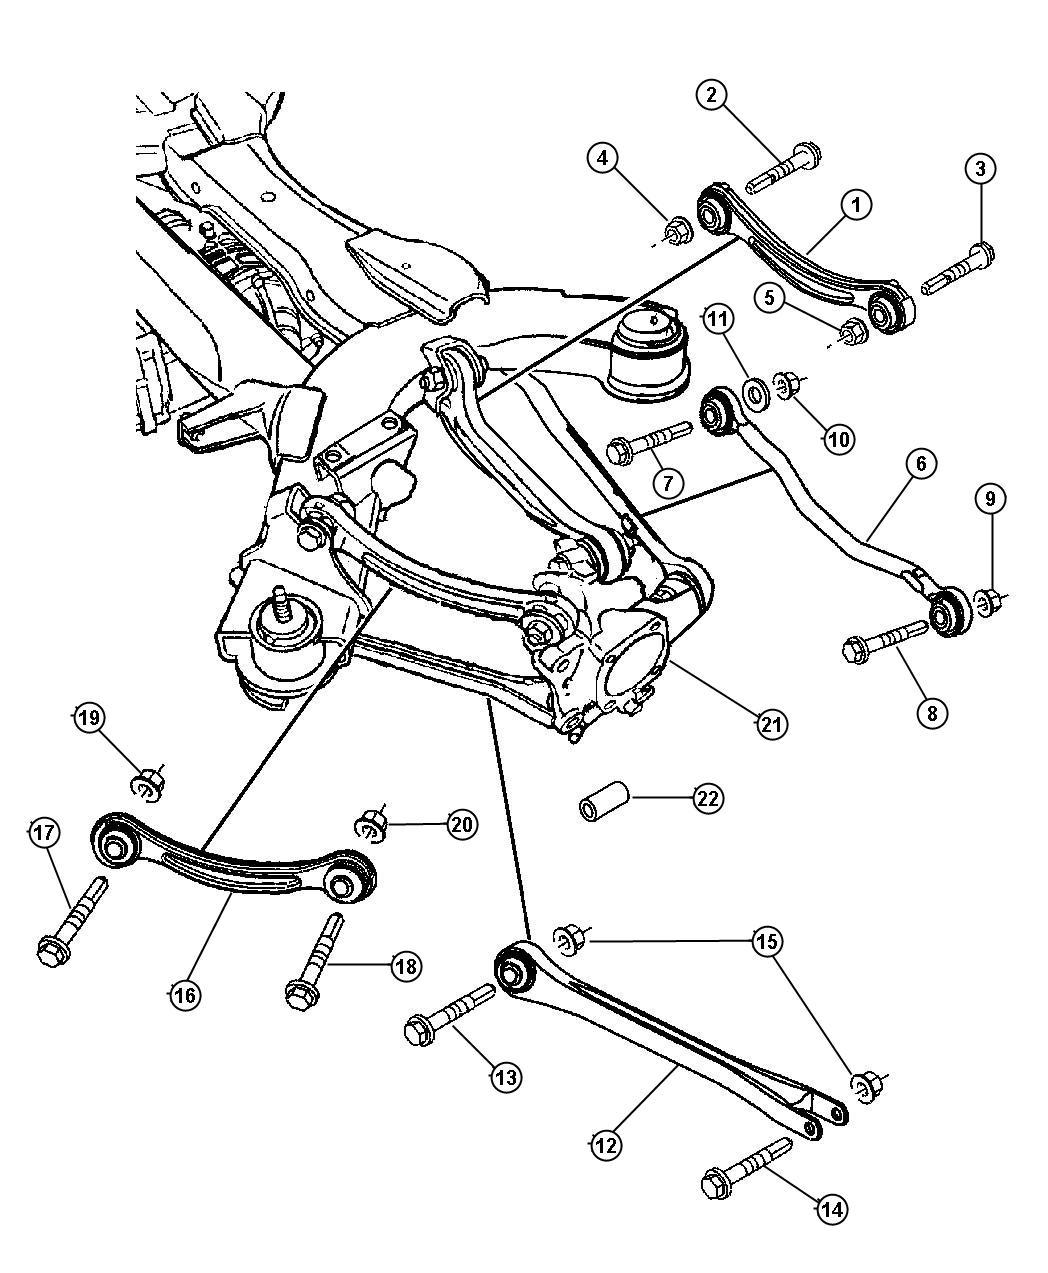 02 Trailblazer Transmission Wiring Diagram